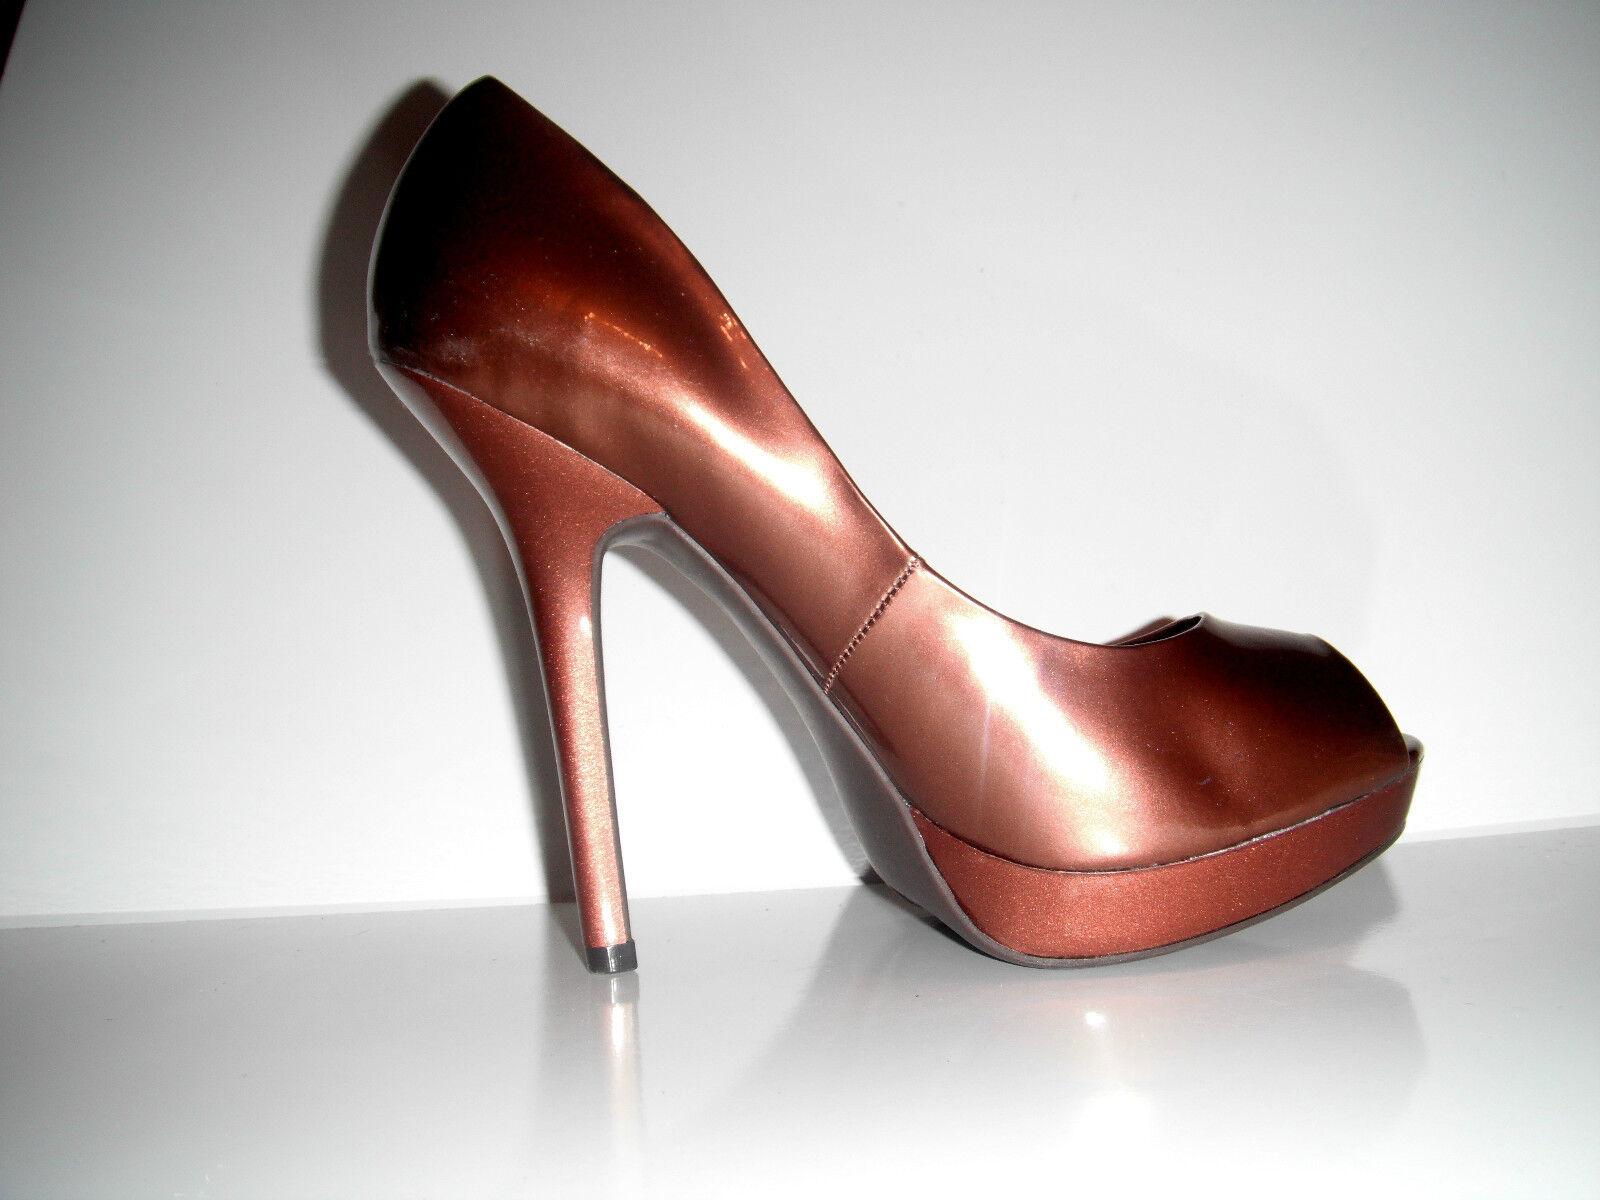 NIB Fergie Women's Holly Peep-Toe Pump Platform  Dress shoes sz 9M